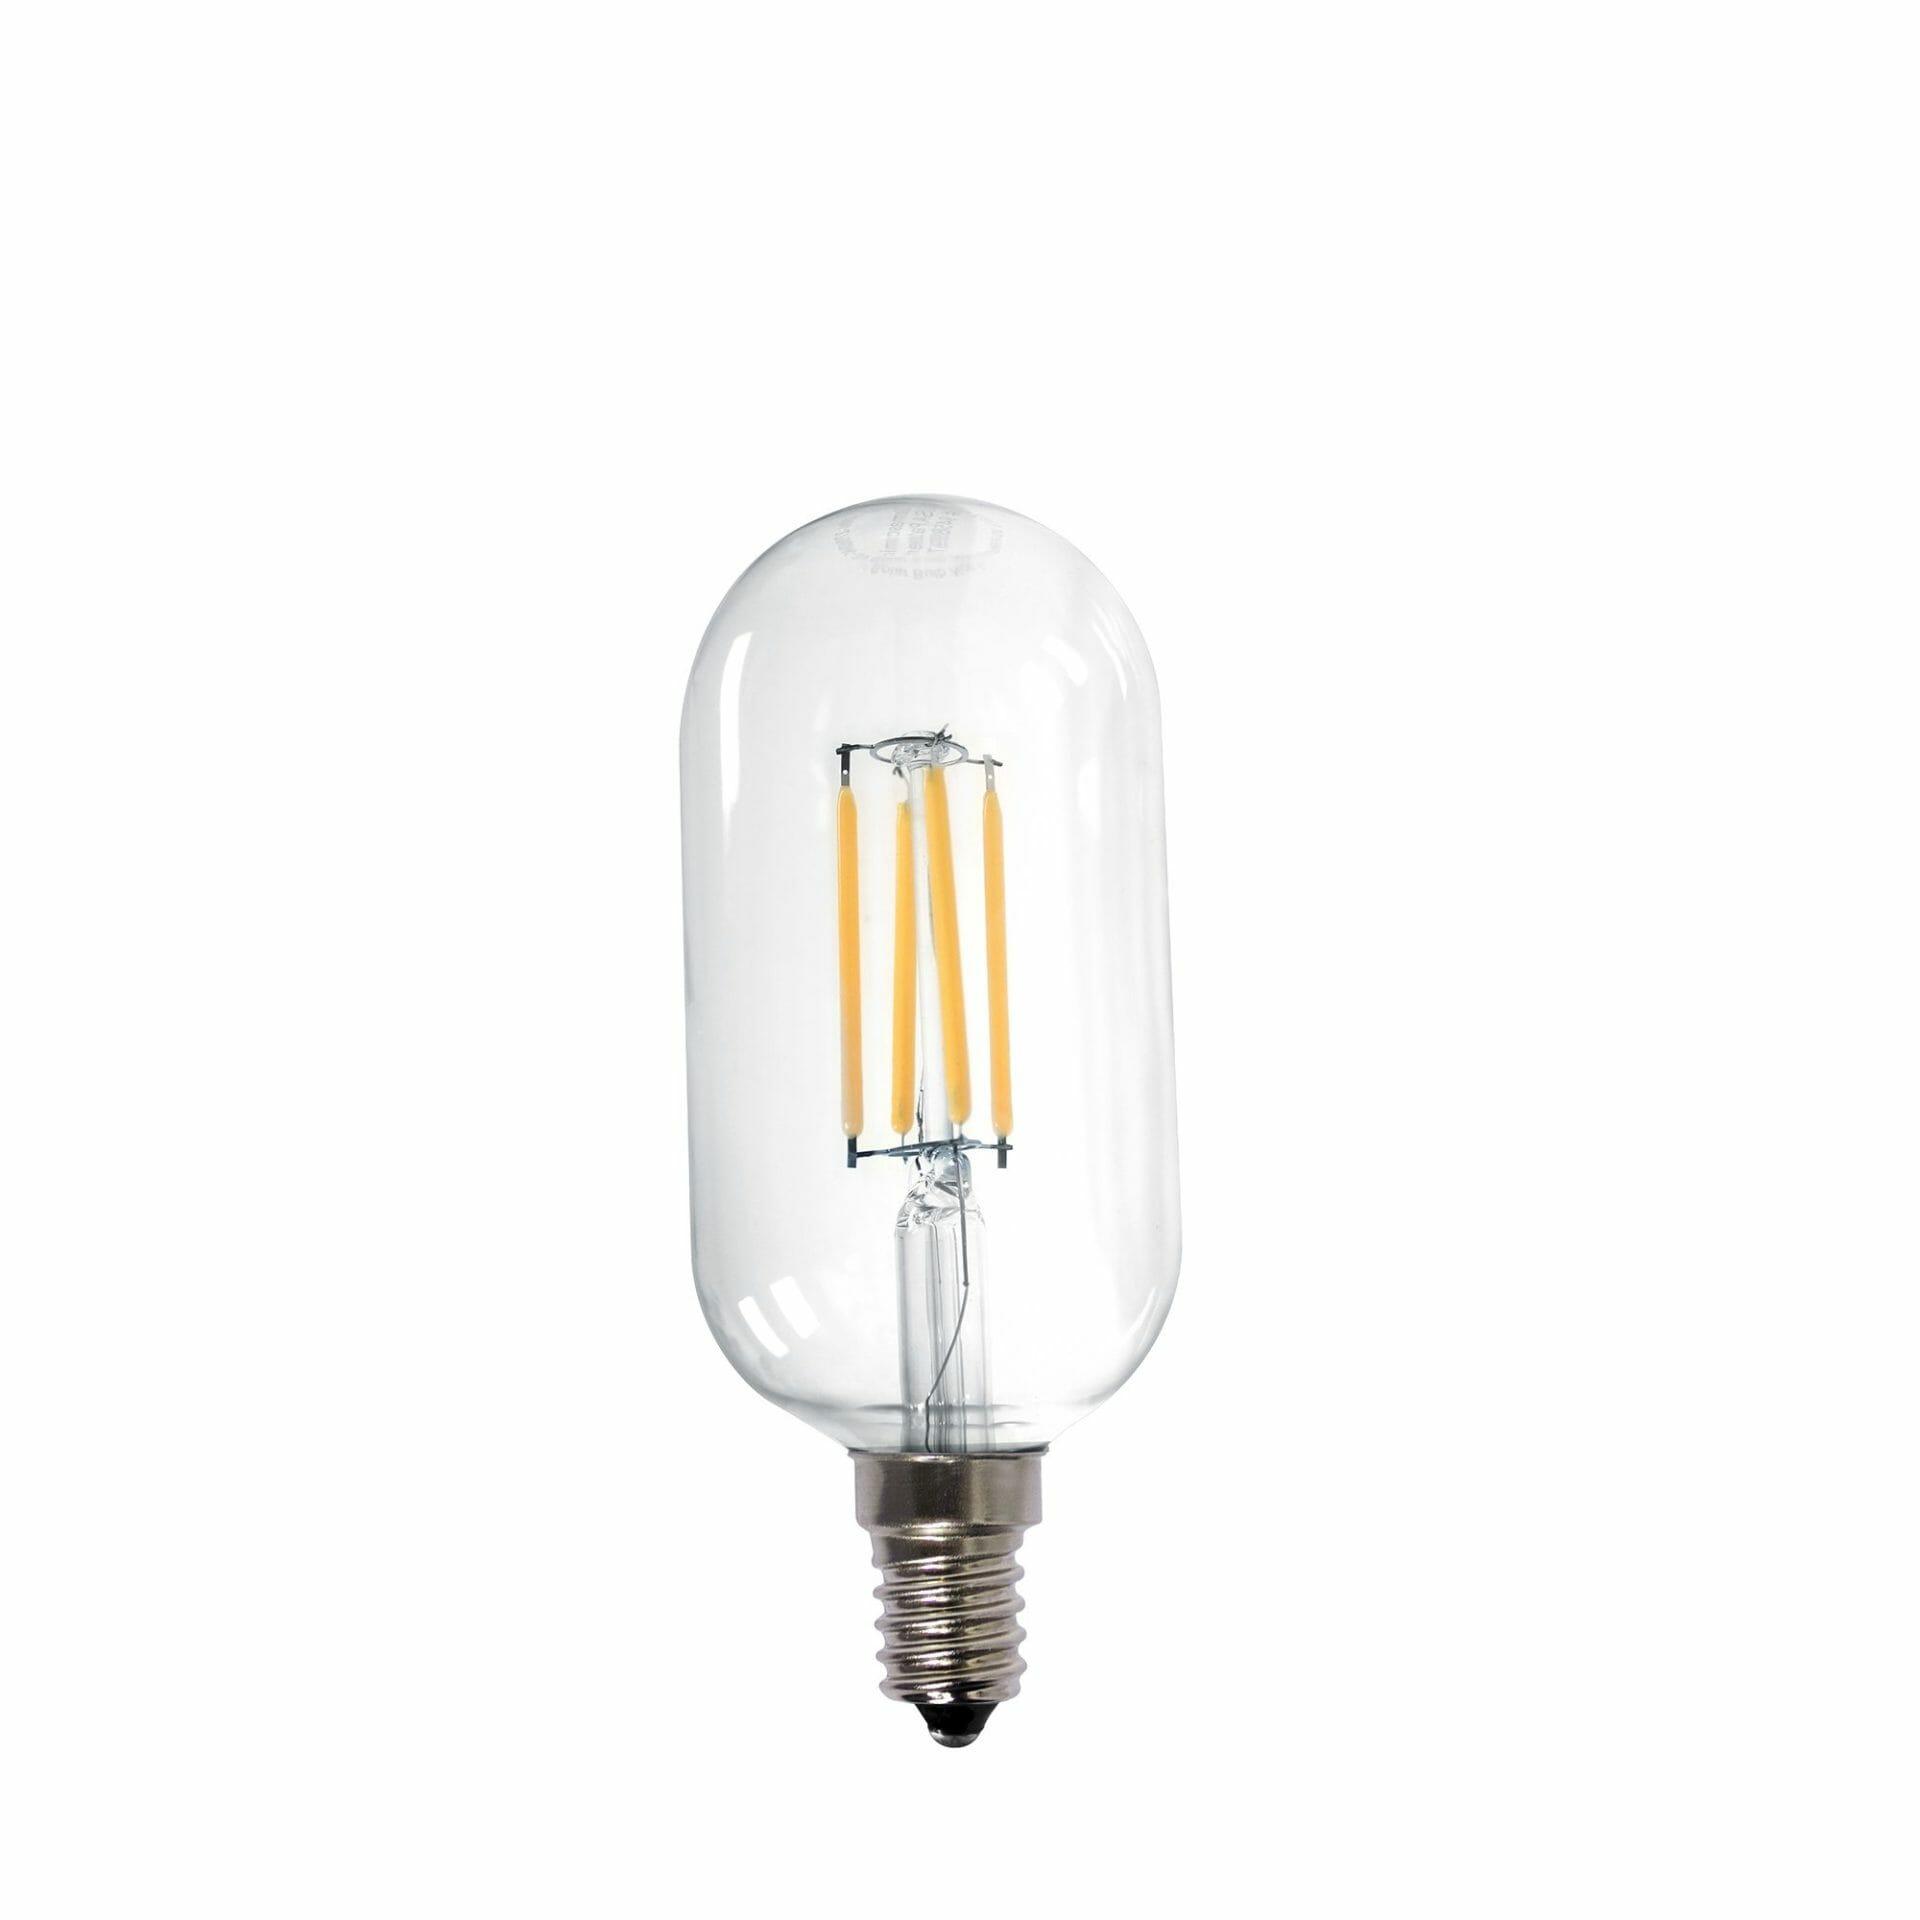 Solar Edison Bulb